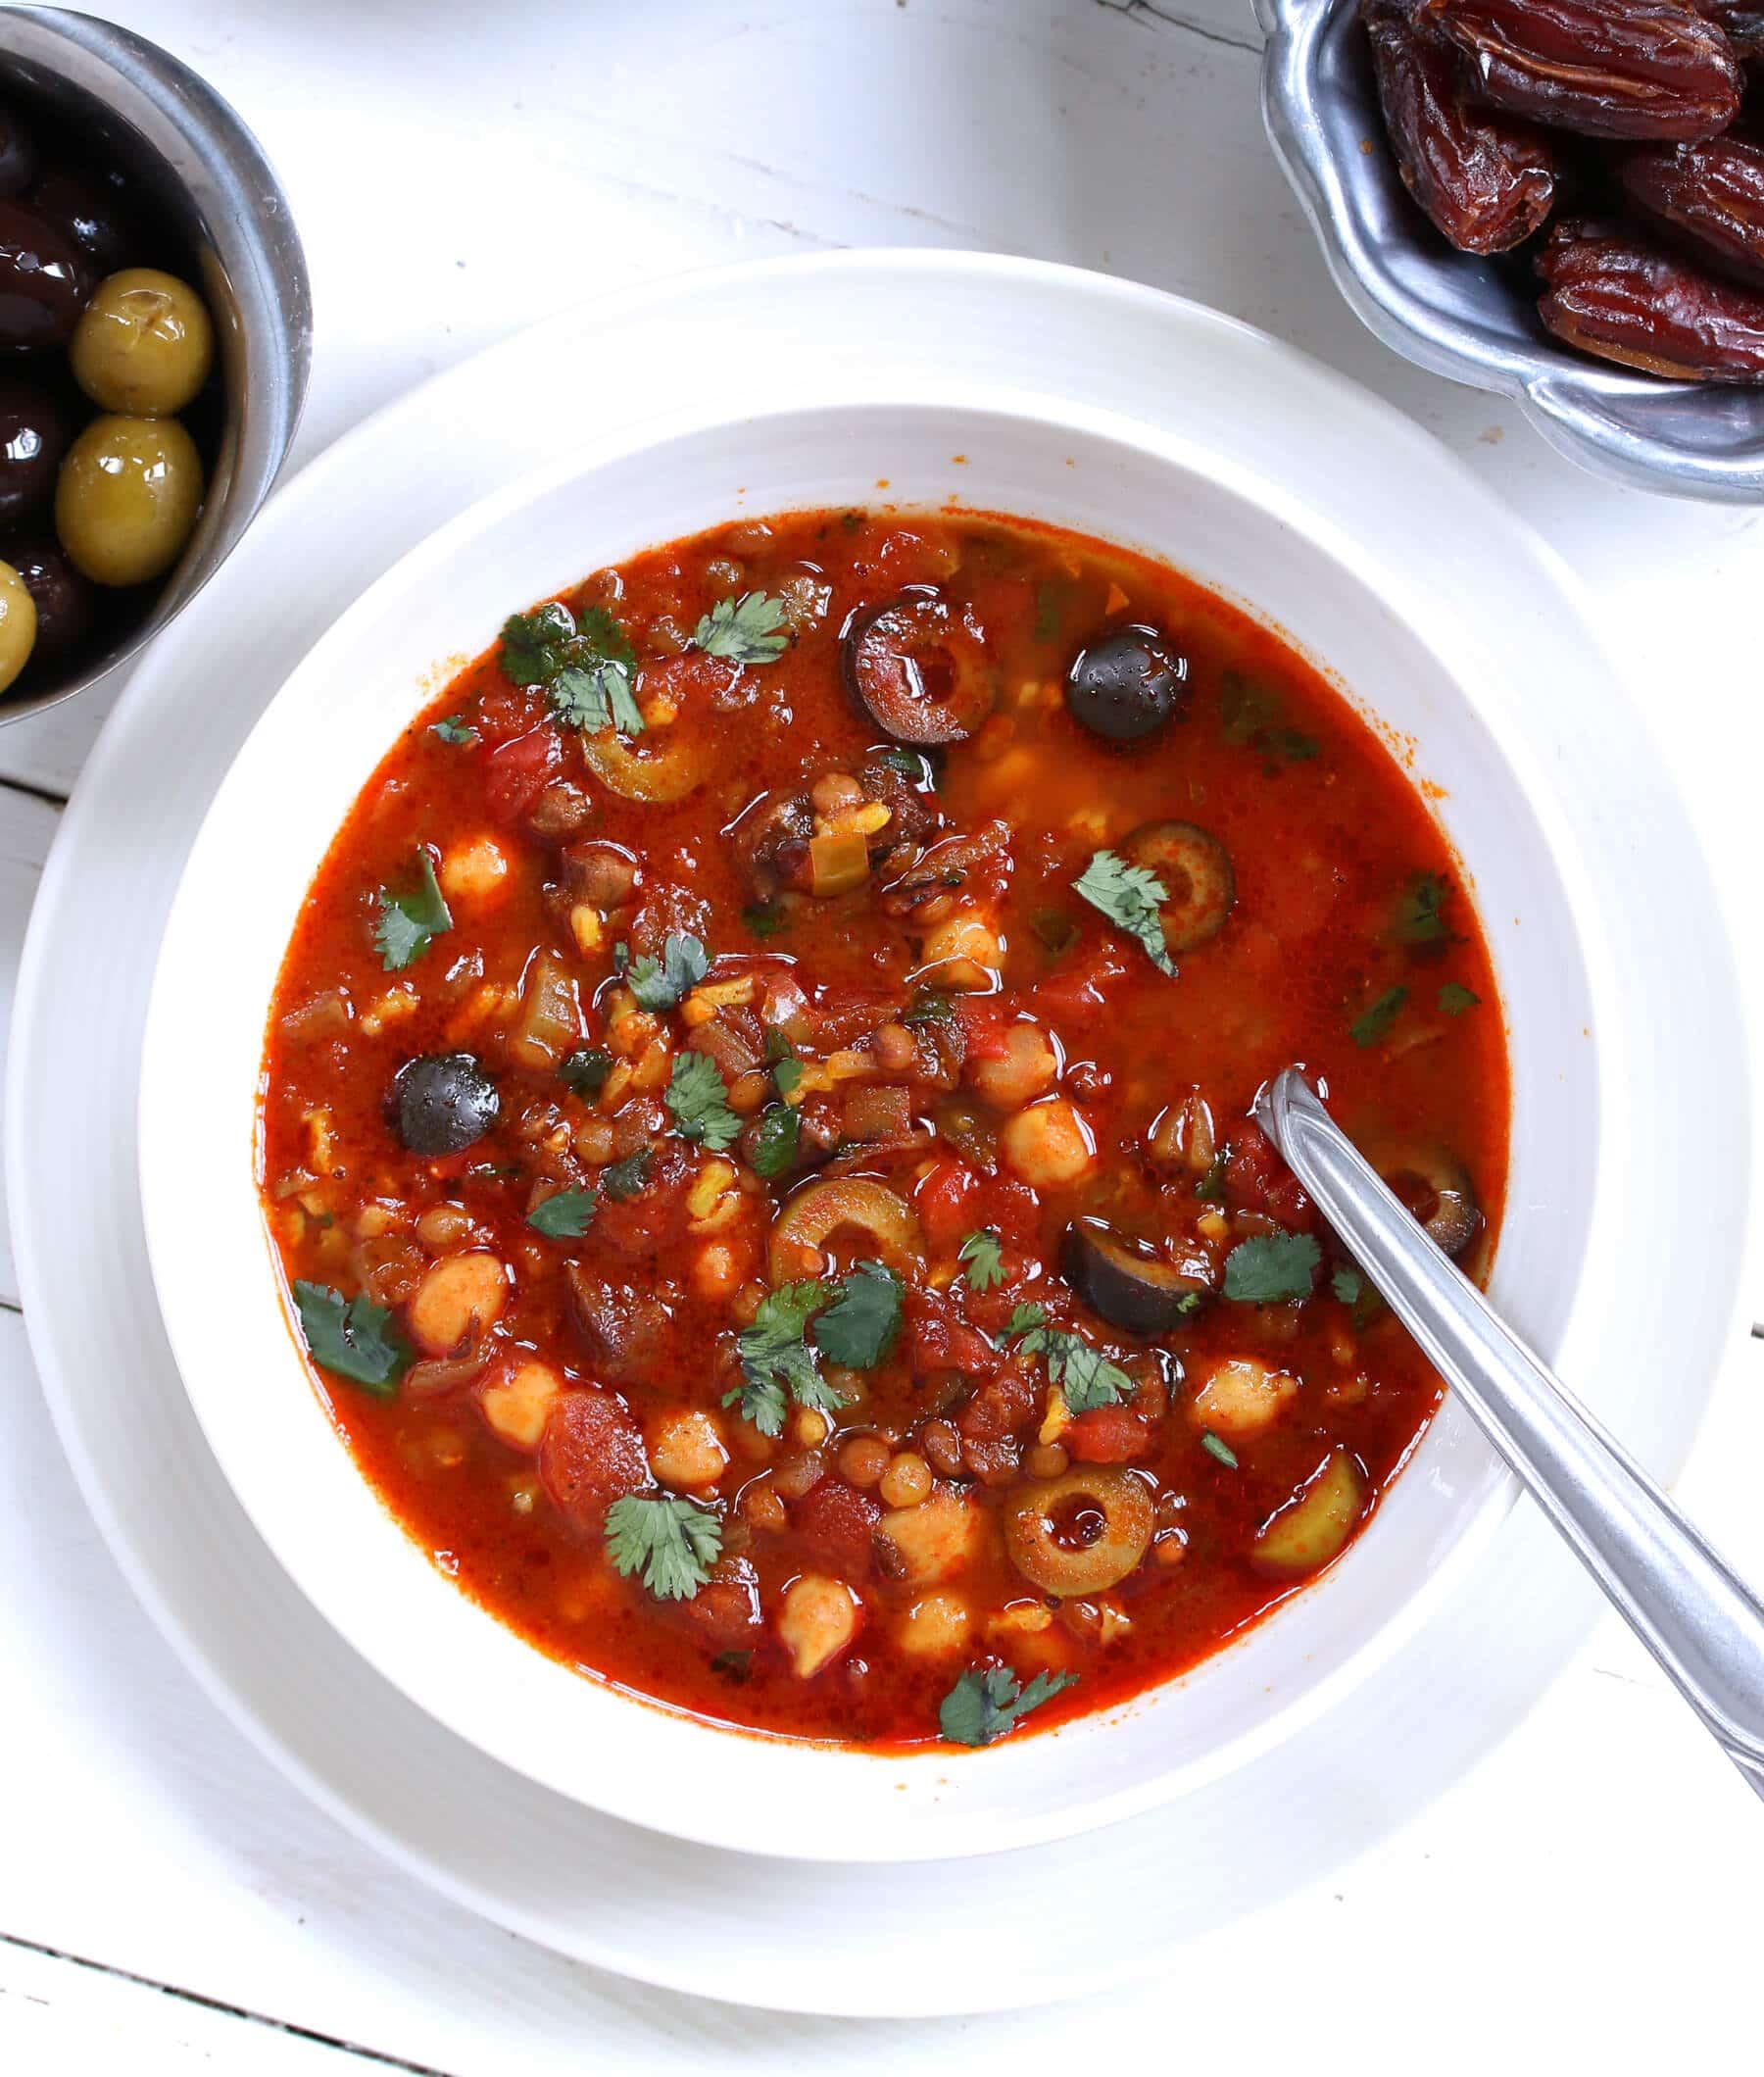 moroccan harira soup stew recipe beef lamb chickpeas garbanzo beans lentils ramadan